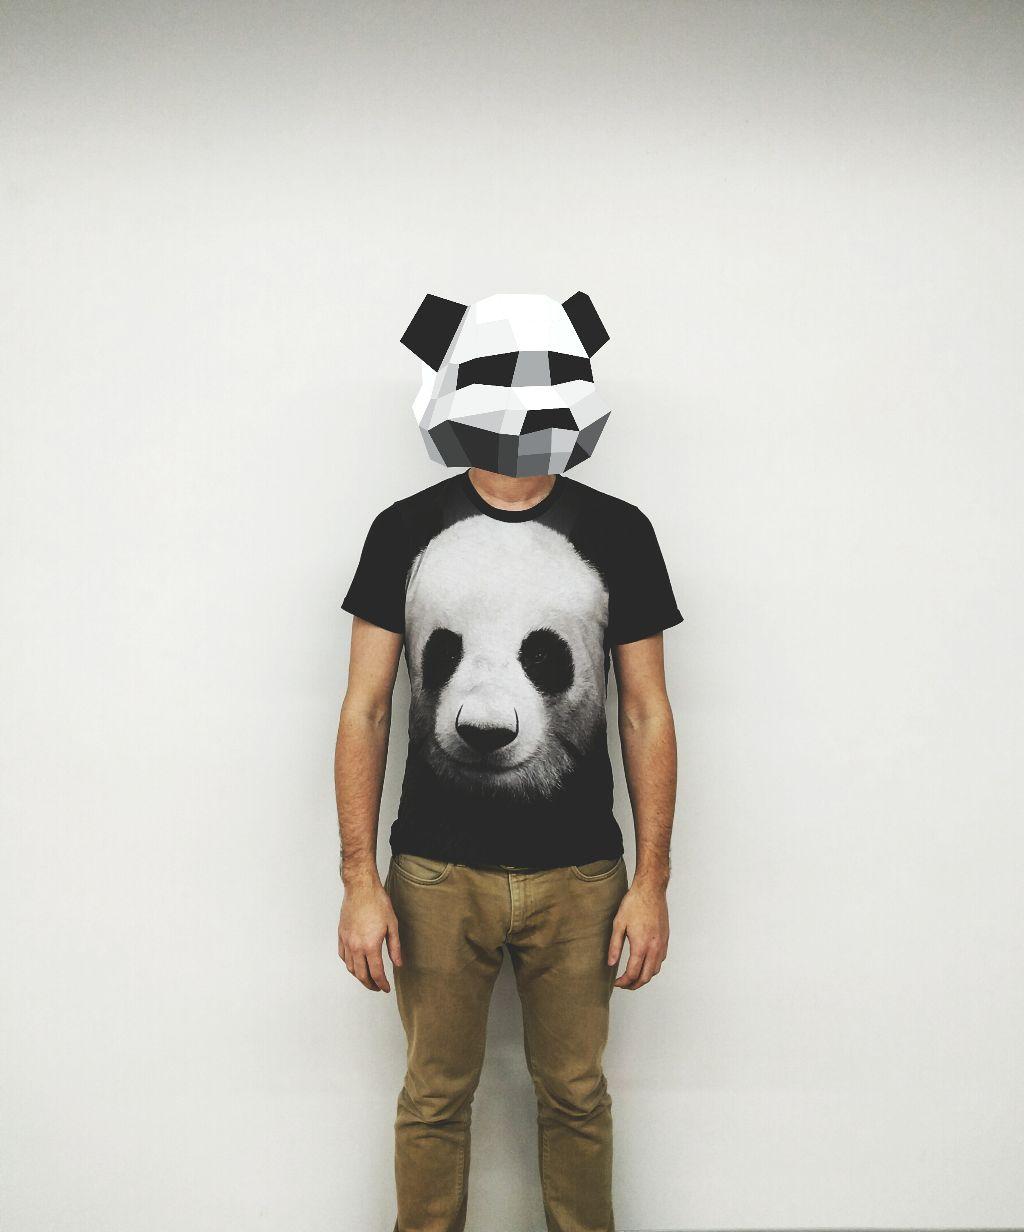 I do love pandas. #AntiSelfie #MadeWithPicsArt